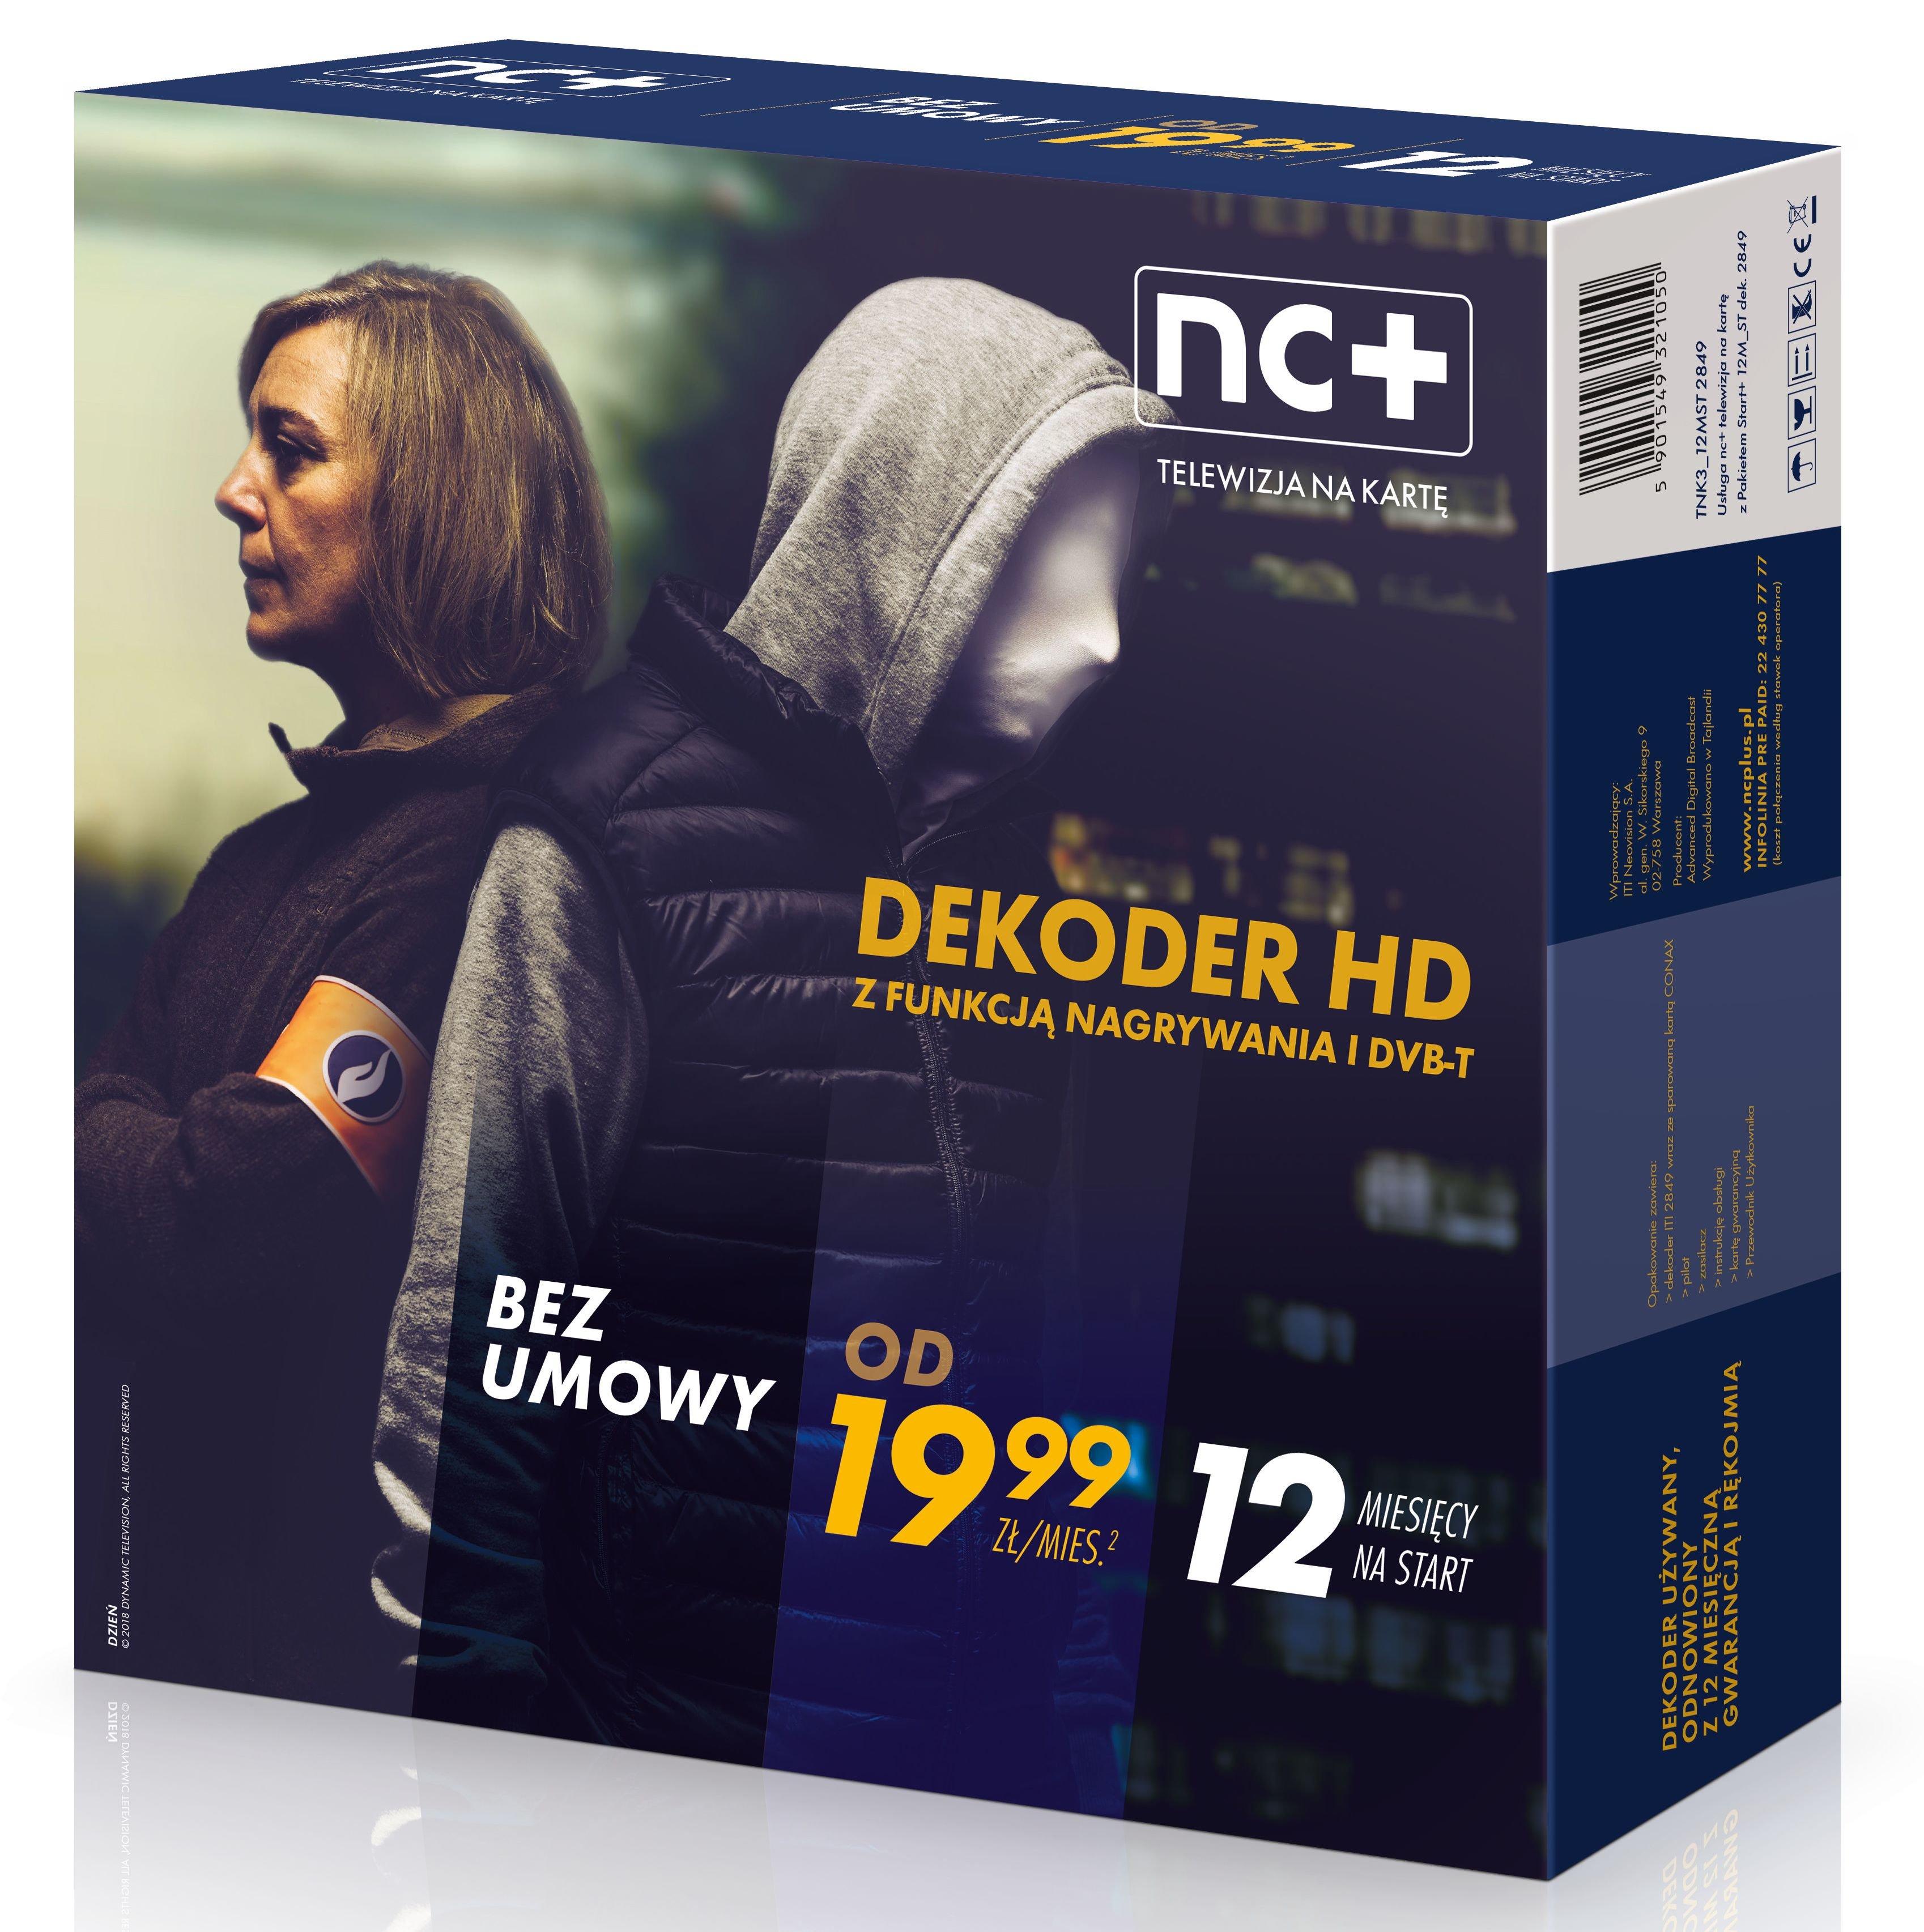 Dekoder Nc Na Karte.Dekoder Nc Iti 2850 Z Usługą Telewizja Na Kartę 12 M C Na Start Z Nc Sklep Internetowy Avans Pl